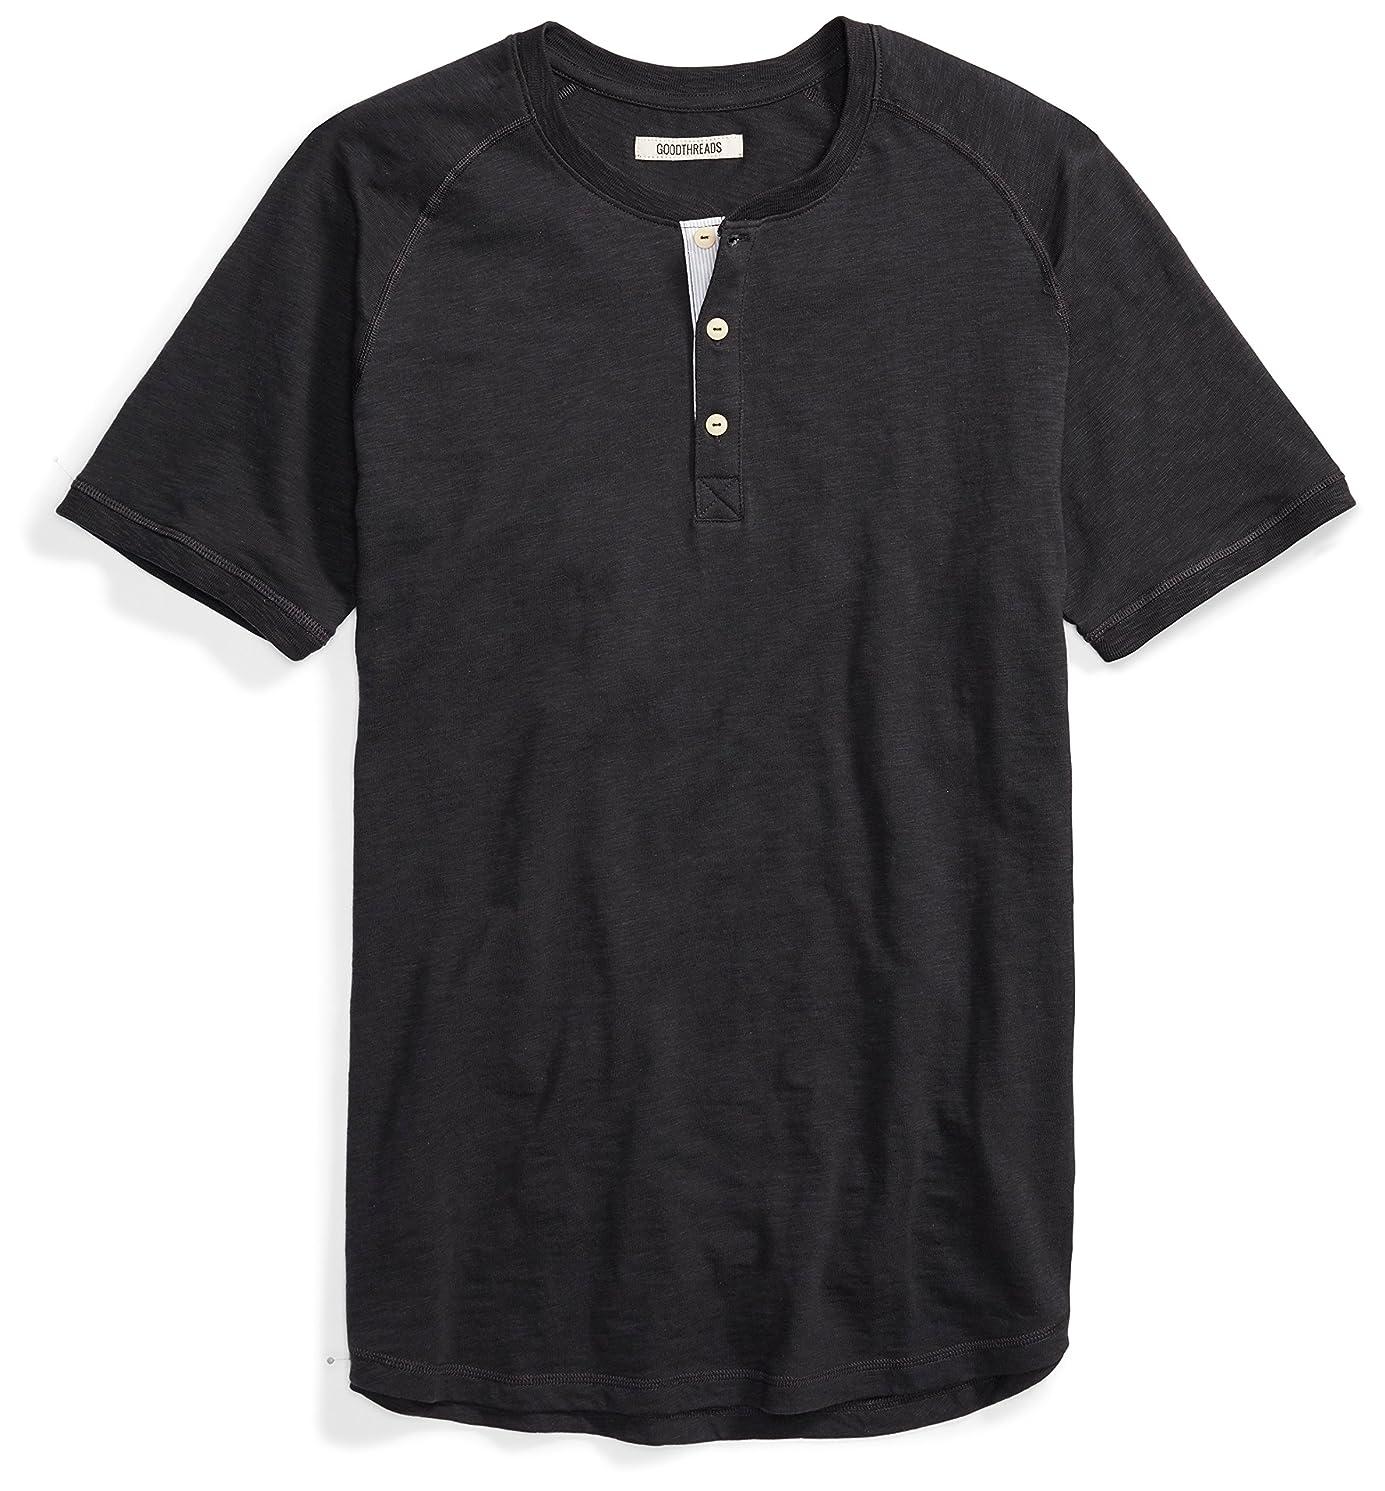 Amazon Brand - Goodthreads Men's Short-Sleeve Lightweight Slub Henley